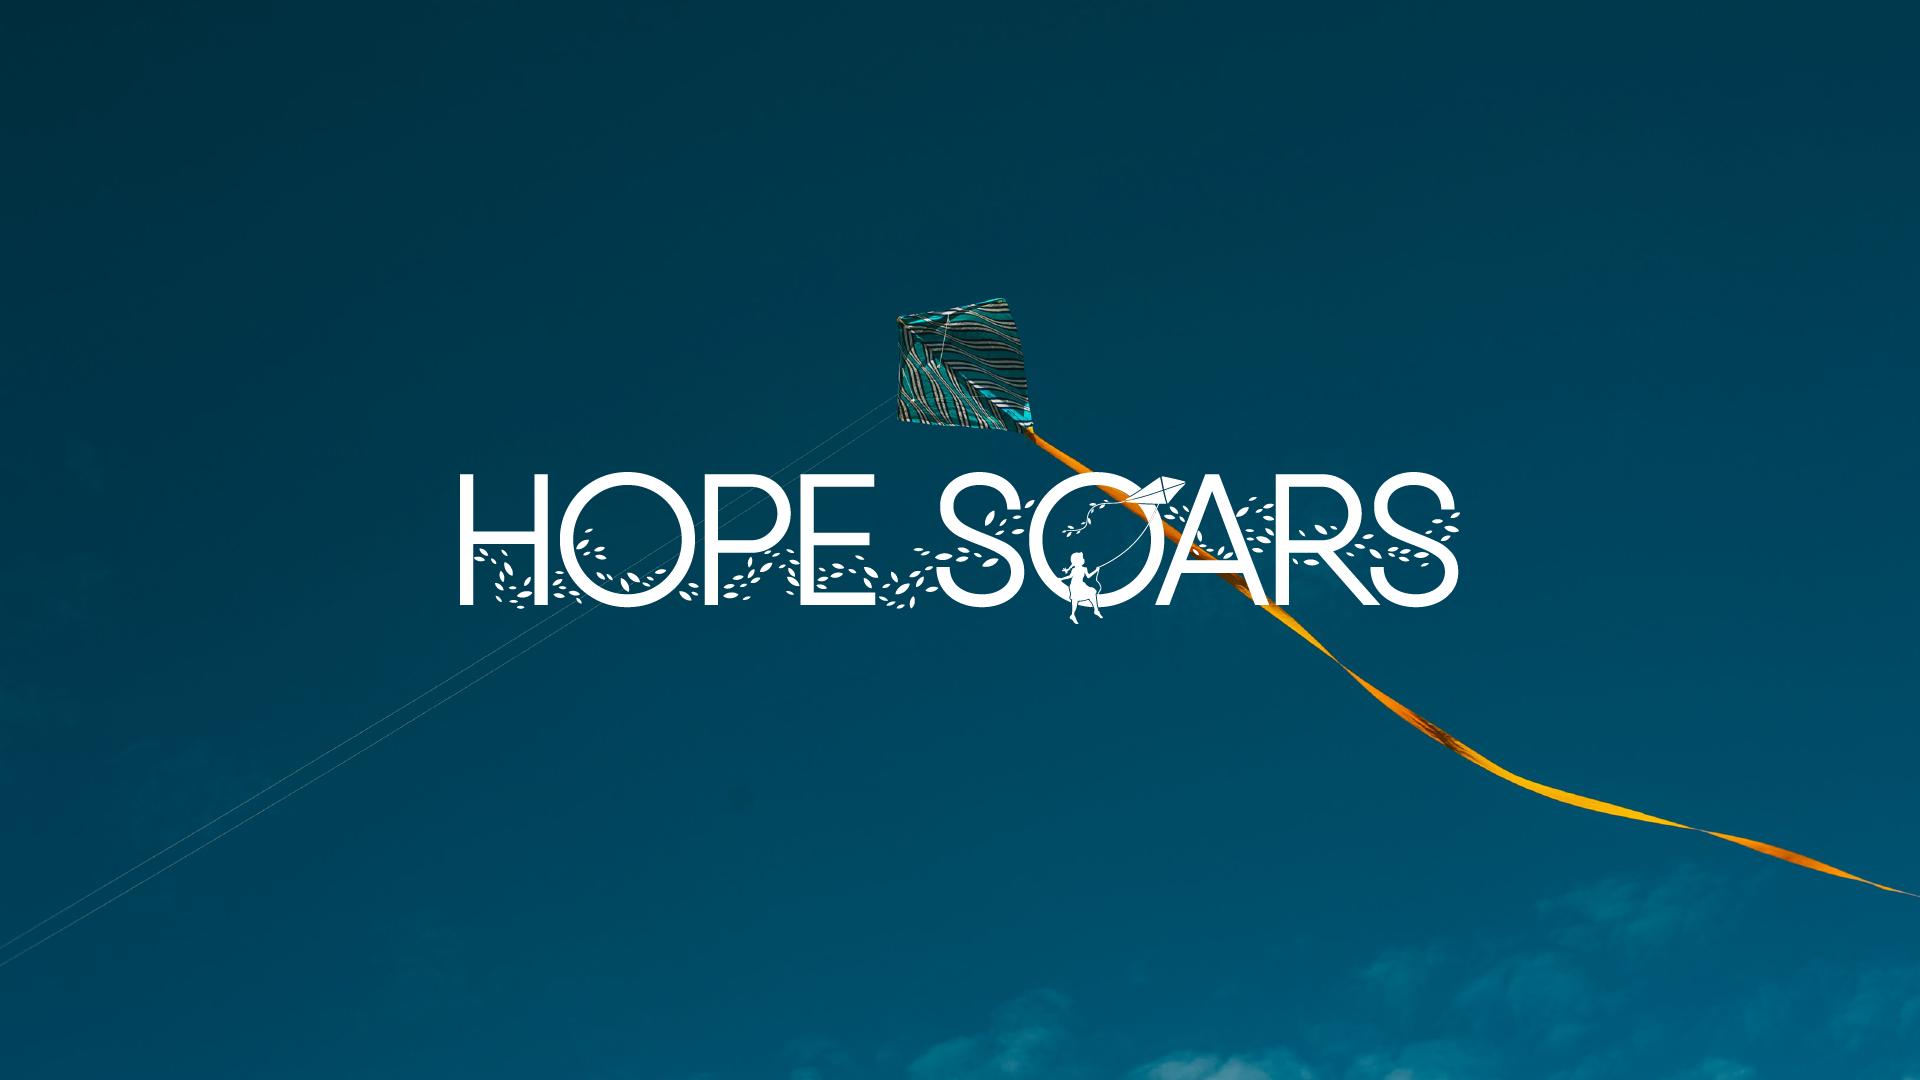 Hope Soars